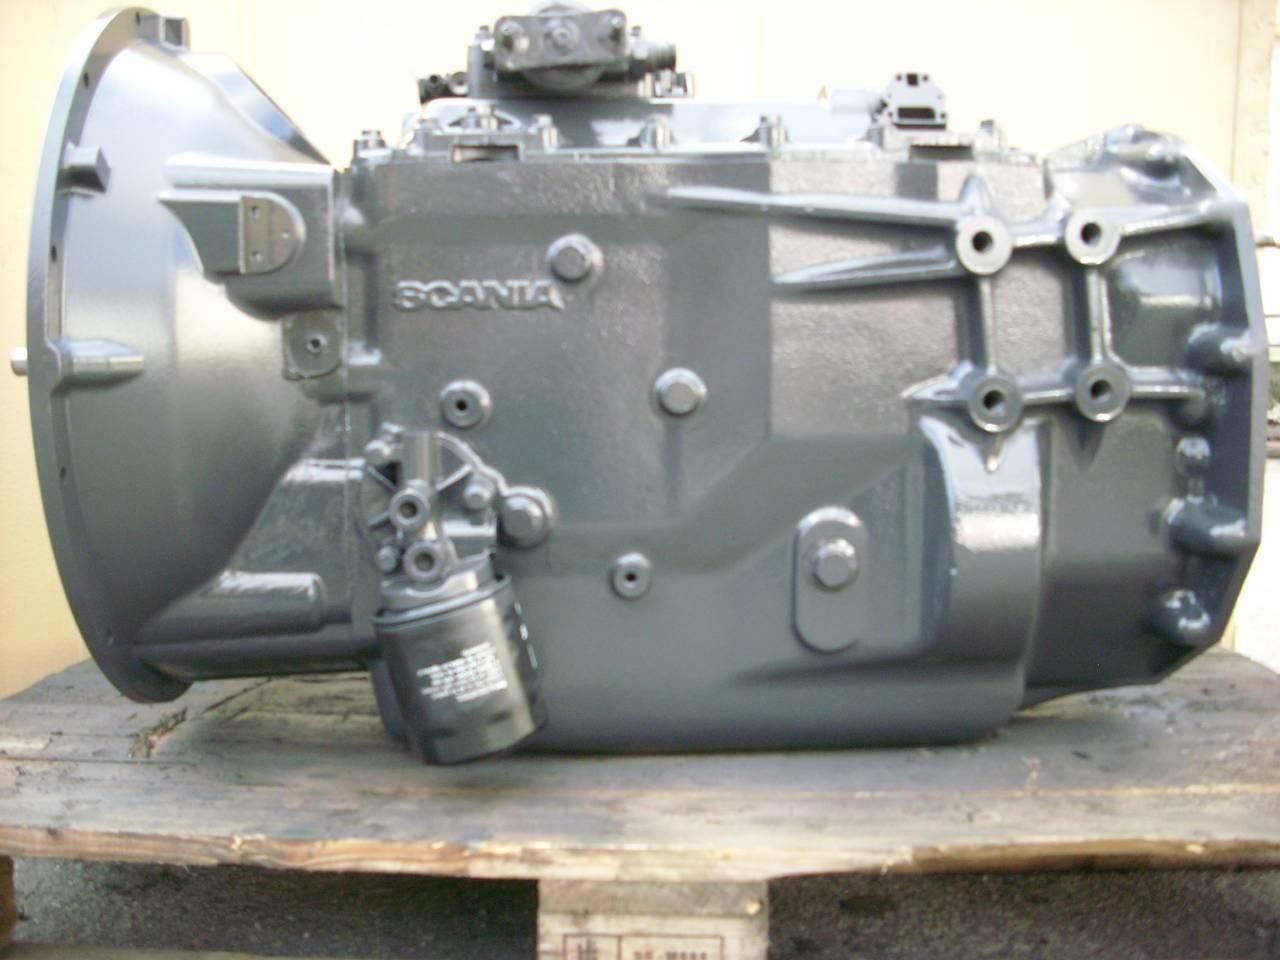 Boite de vitesses occasion scania grs920r groupe aubr e for Garage boite de vitesse